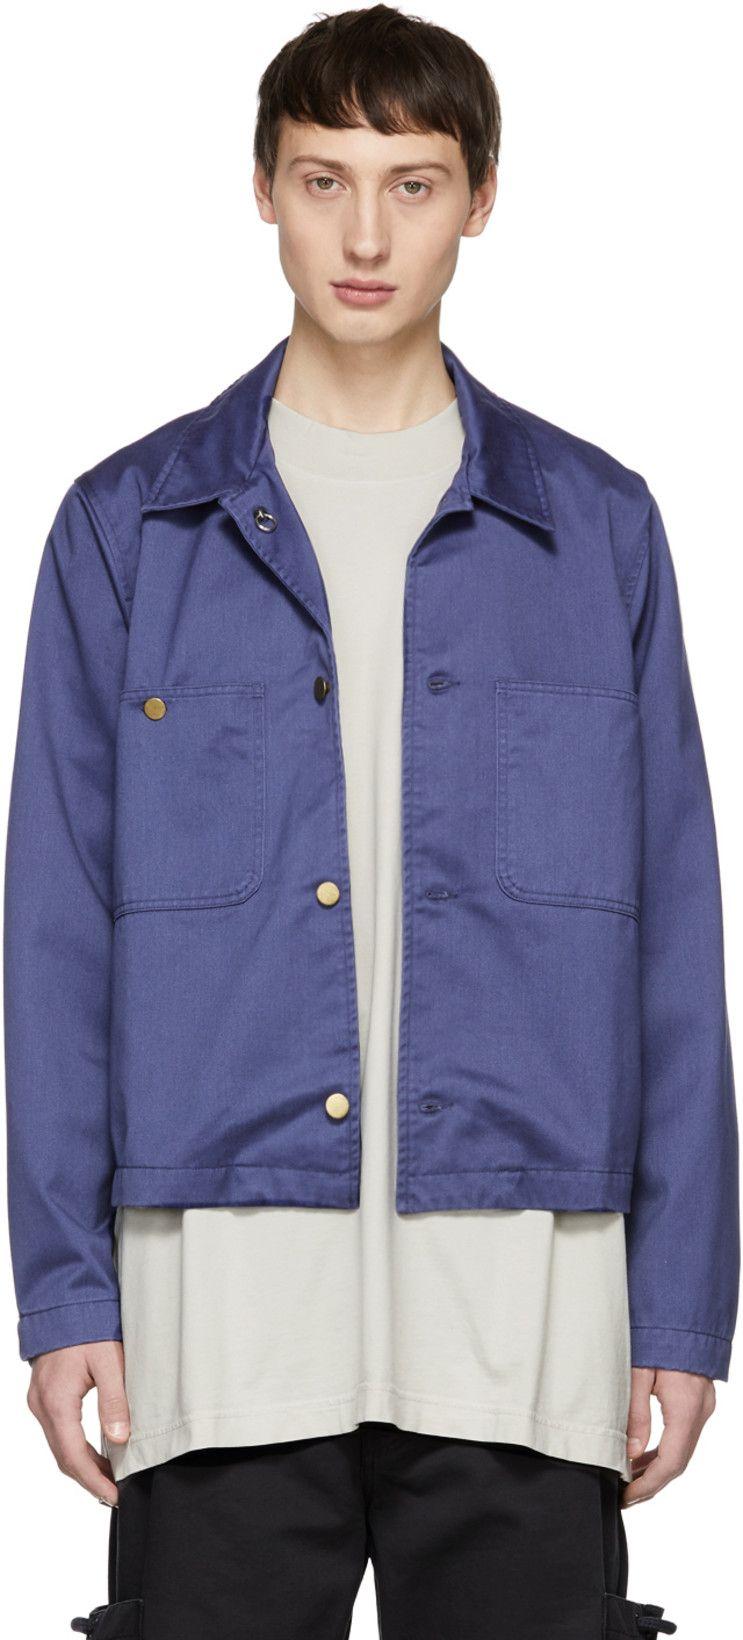 29a0079e Acne Studios - Blue Blå Konst Unreal Jacket | Man | Jackets, Acne ...